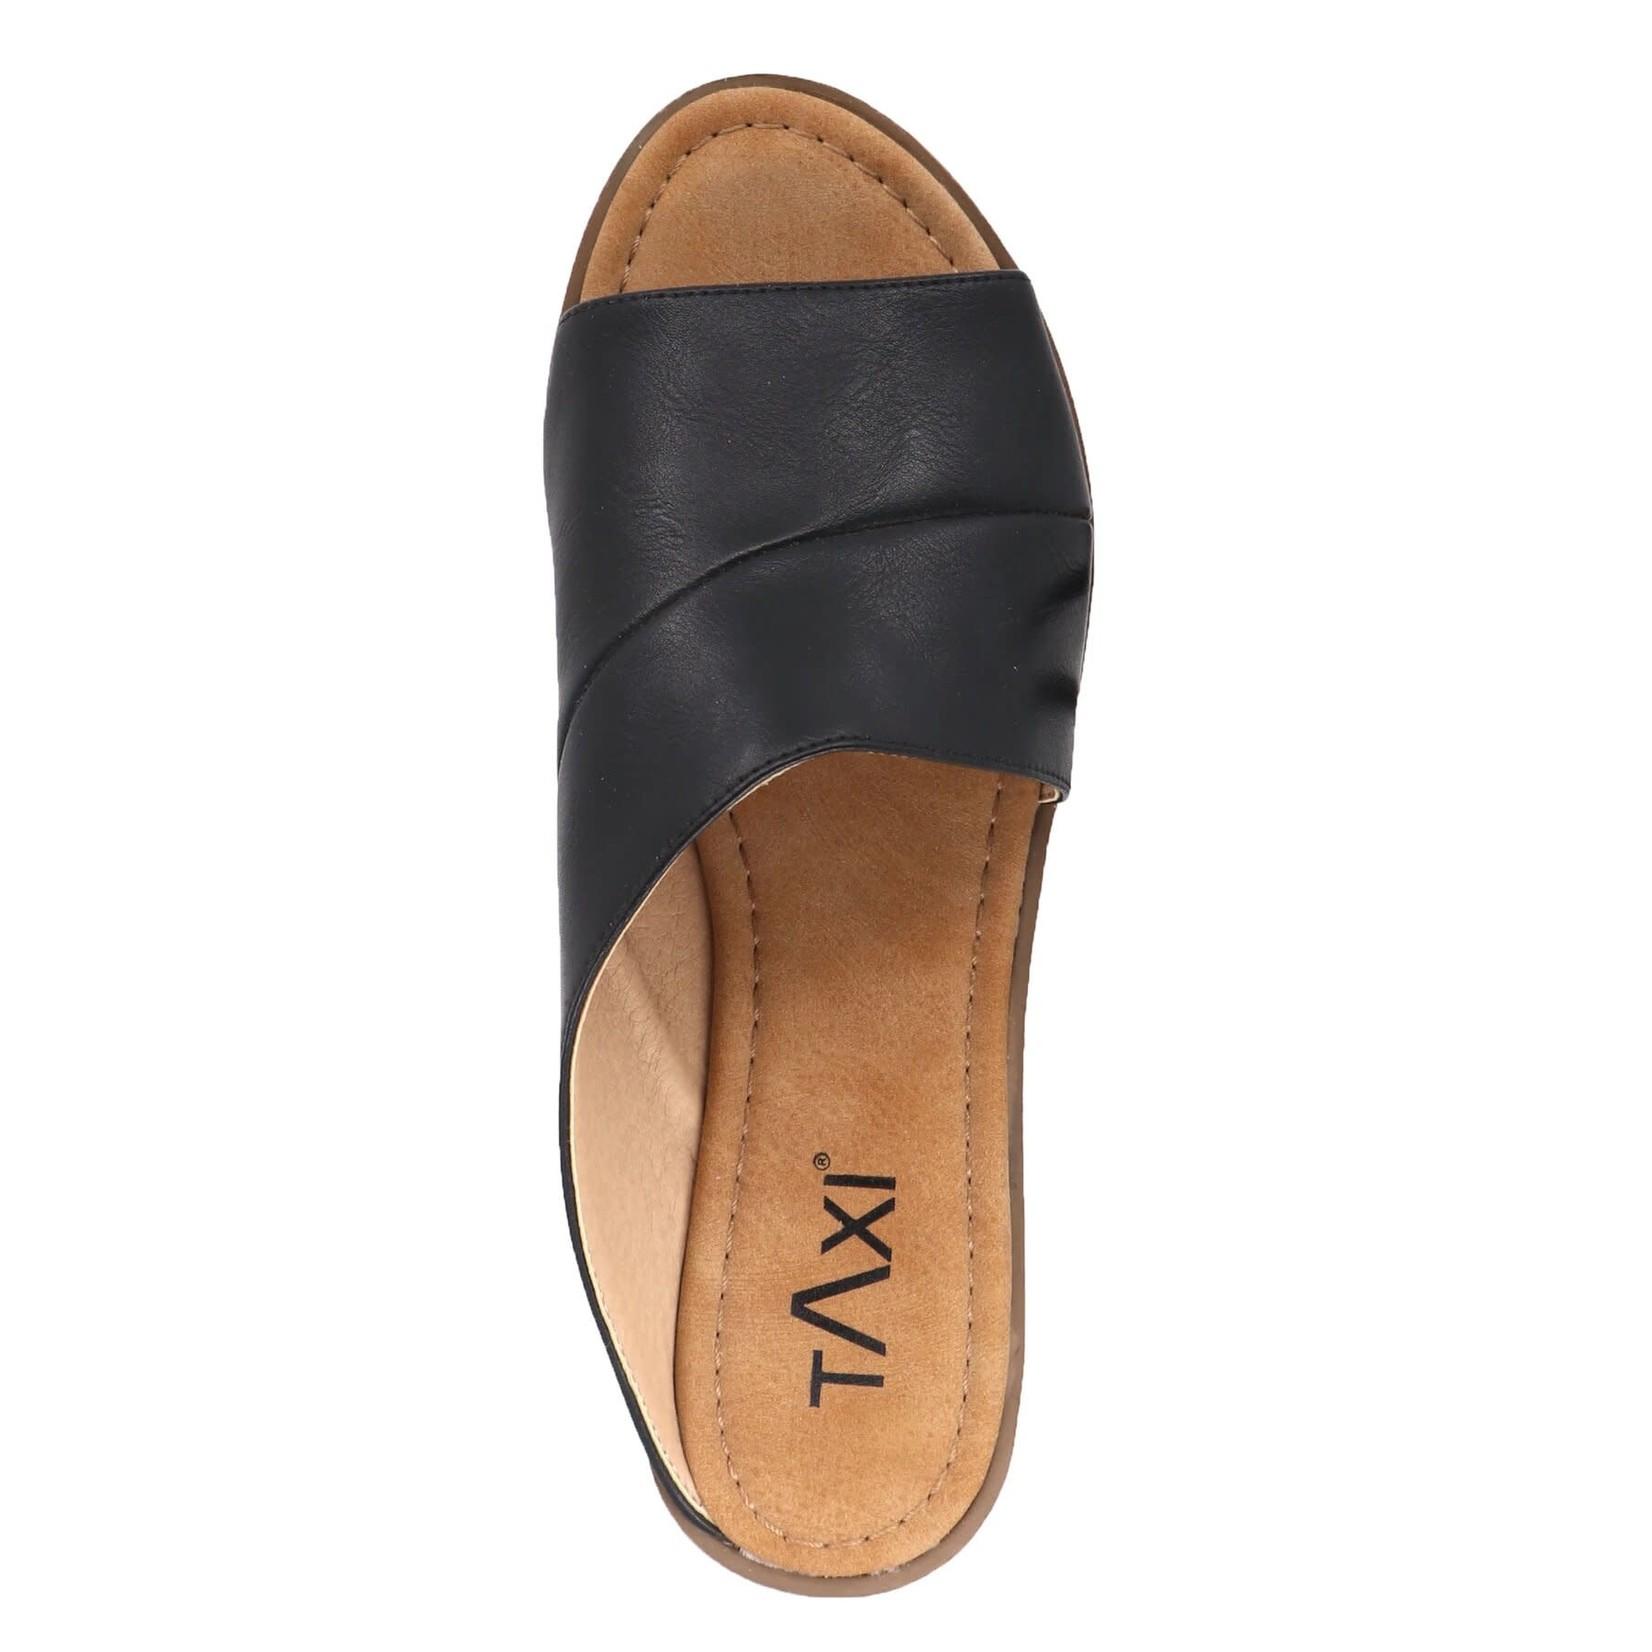 Taxi Footwear Sheena *2 Colors*